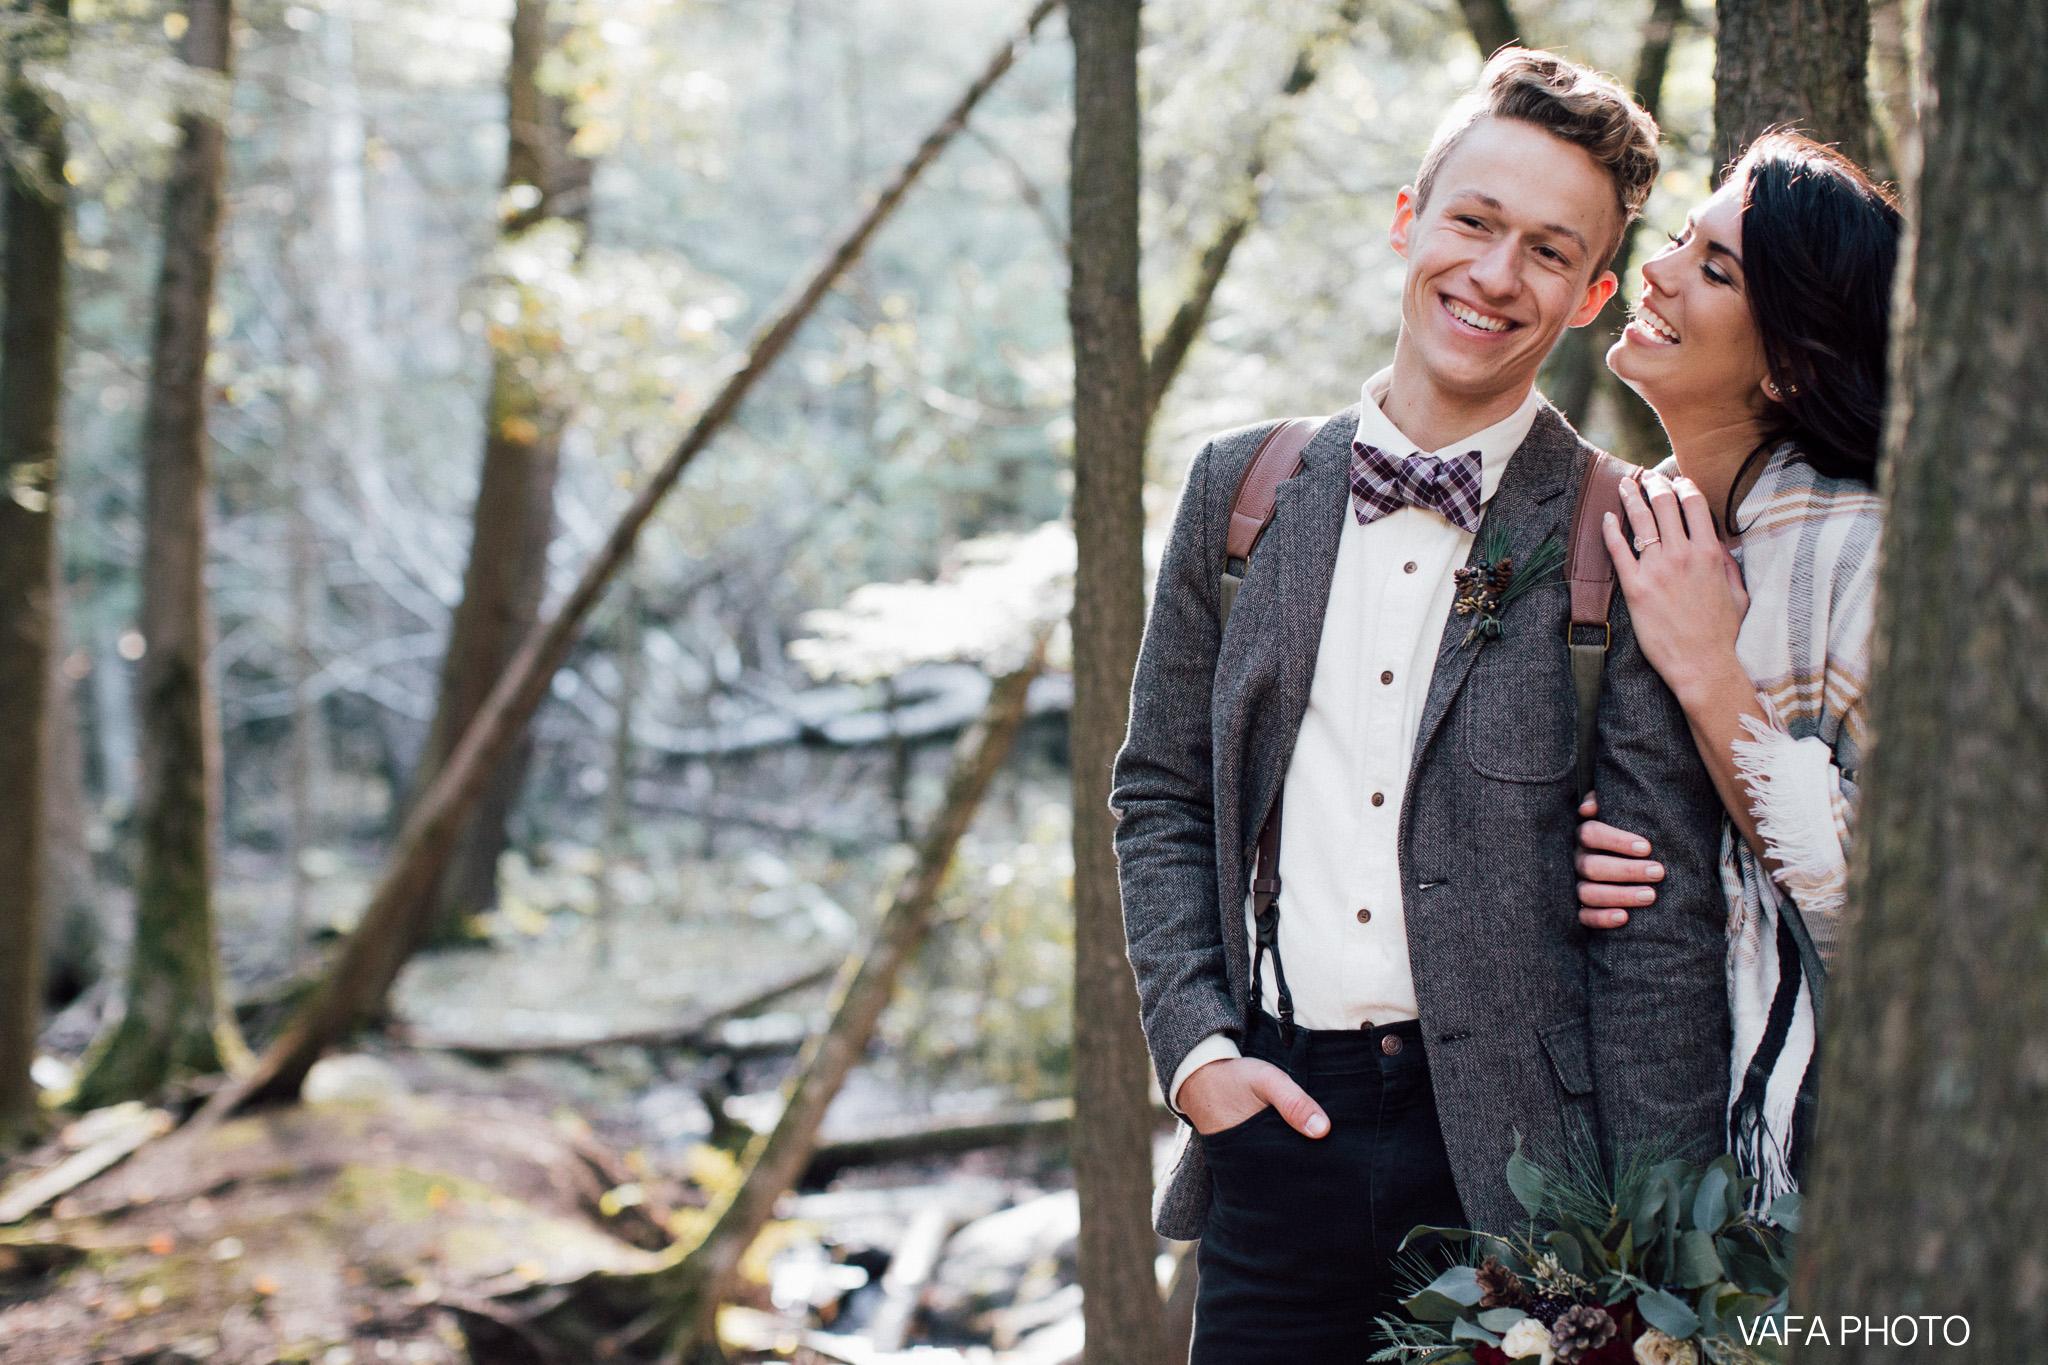 Hogback-Mountain-Wedding-Chelsea-Josh-Vafa-Photo-491.jpg